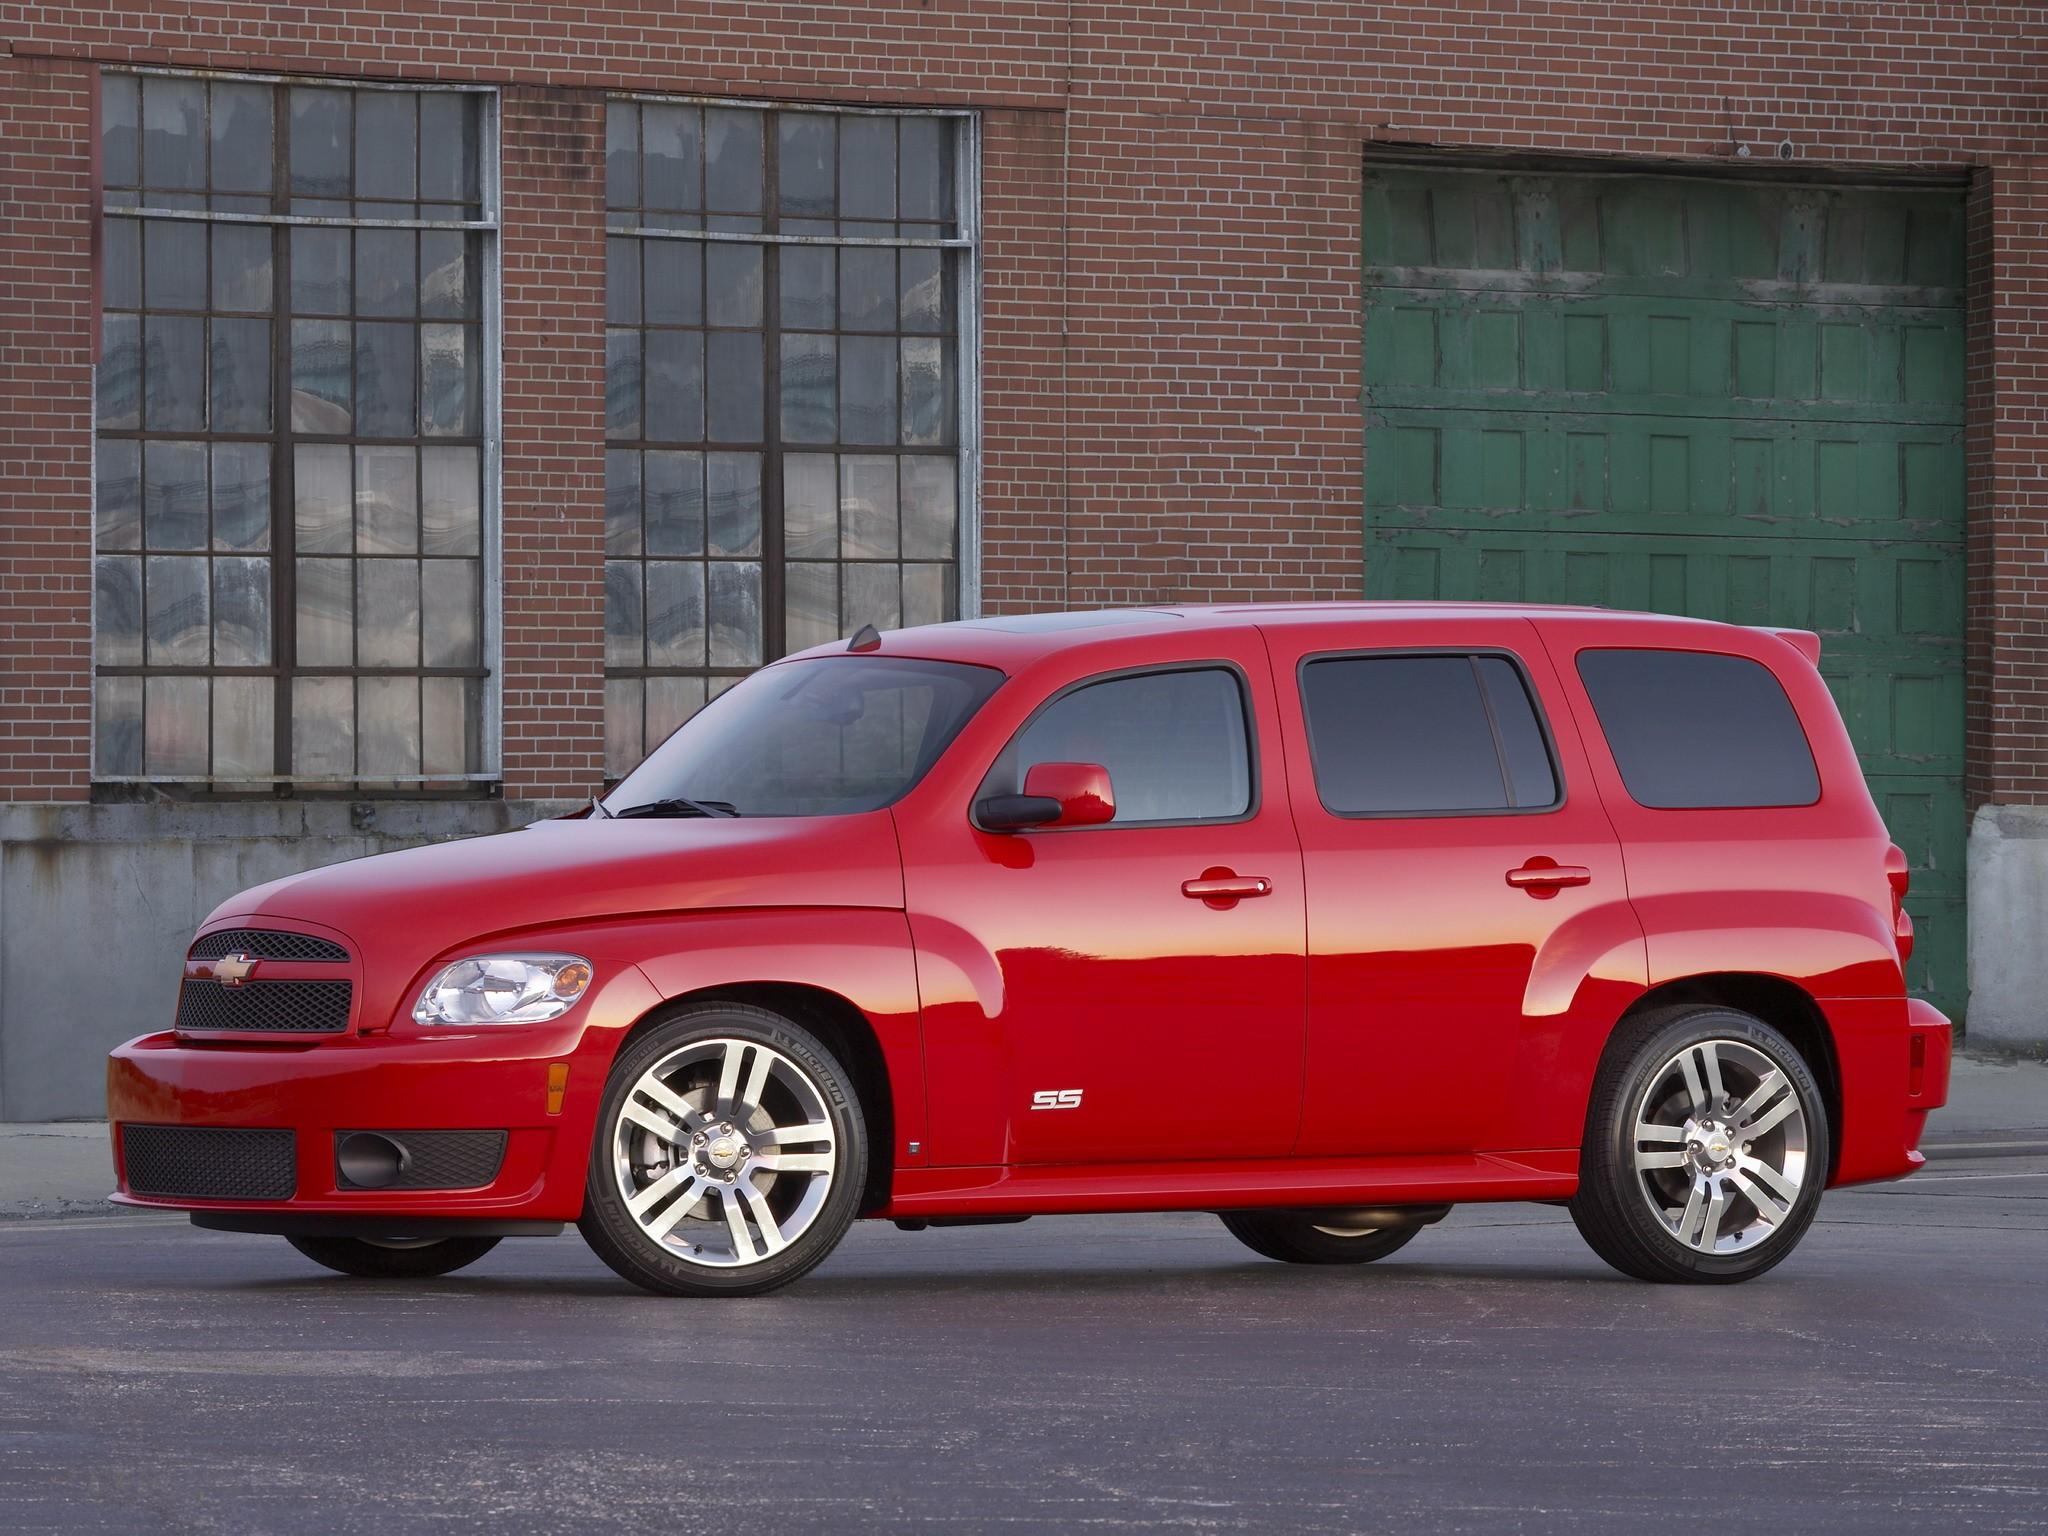 Chevrolet Hhr Ss Specs 2007 2008 2009 2010 2011